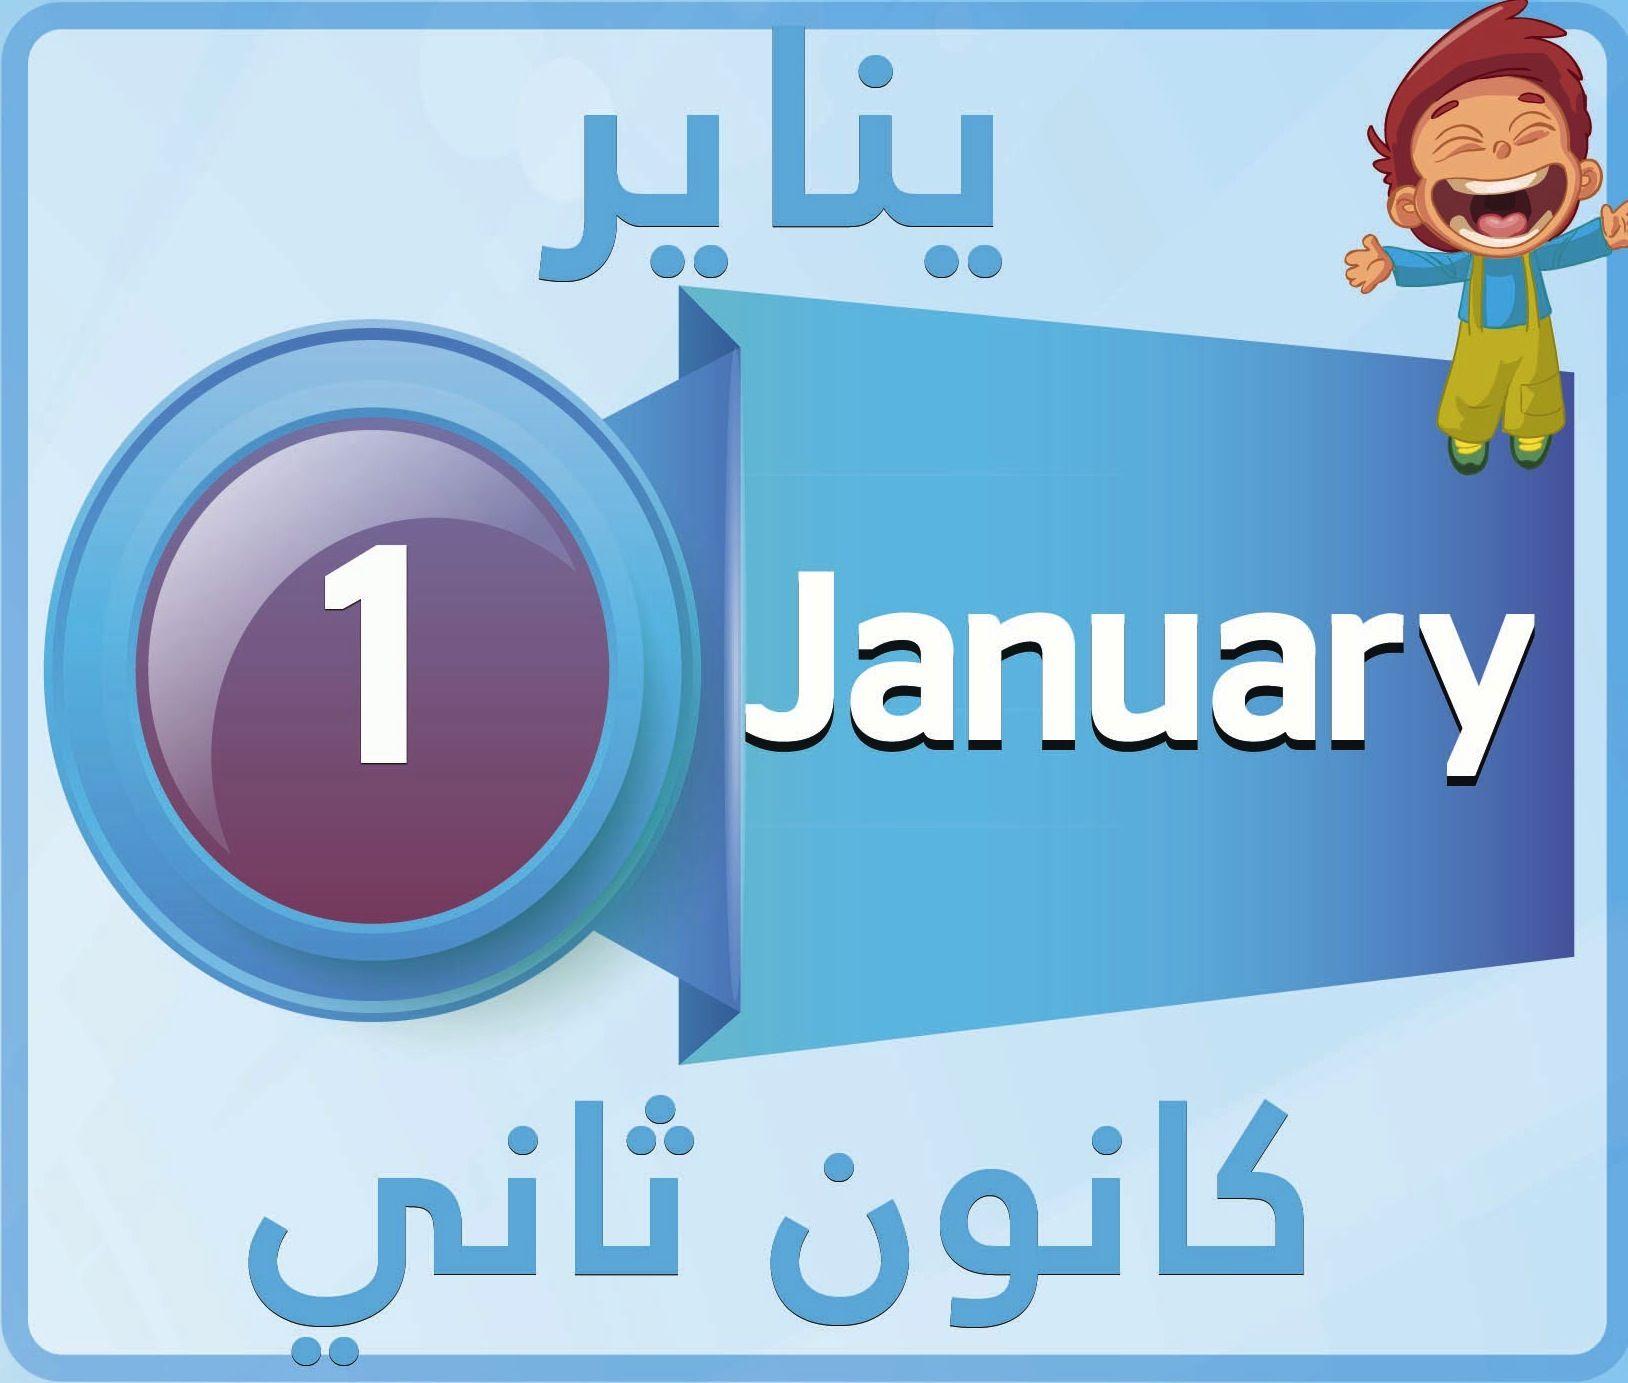 كانون ثاني هو الشهر اﻻول من السنة الميلادية January Is The First Month Enjoy Learning With Einstylo Fun To Quiet Book Arabic Worksheets Books